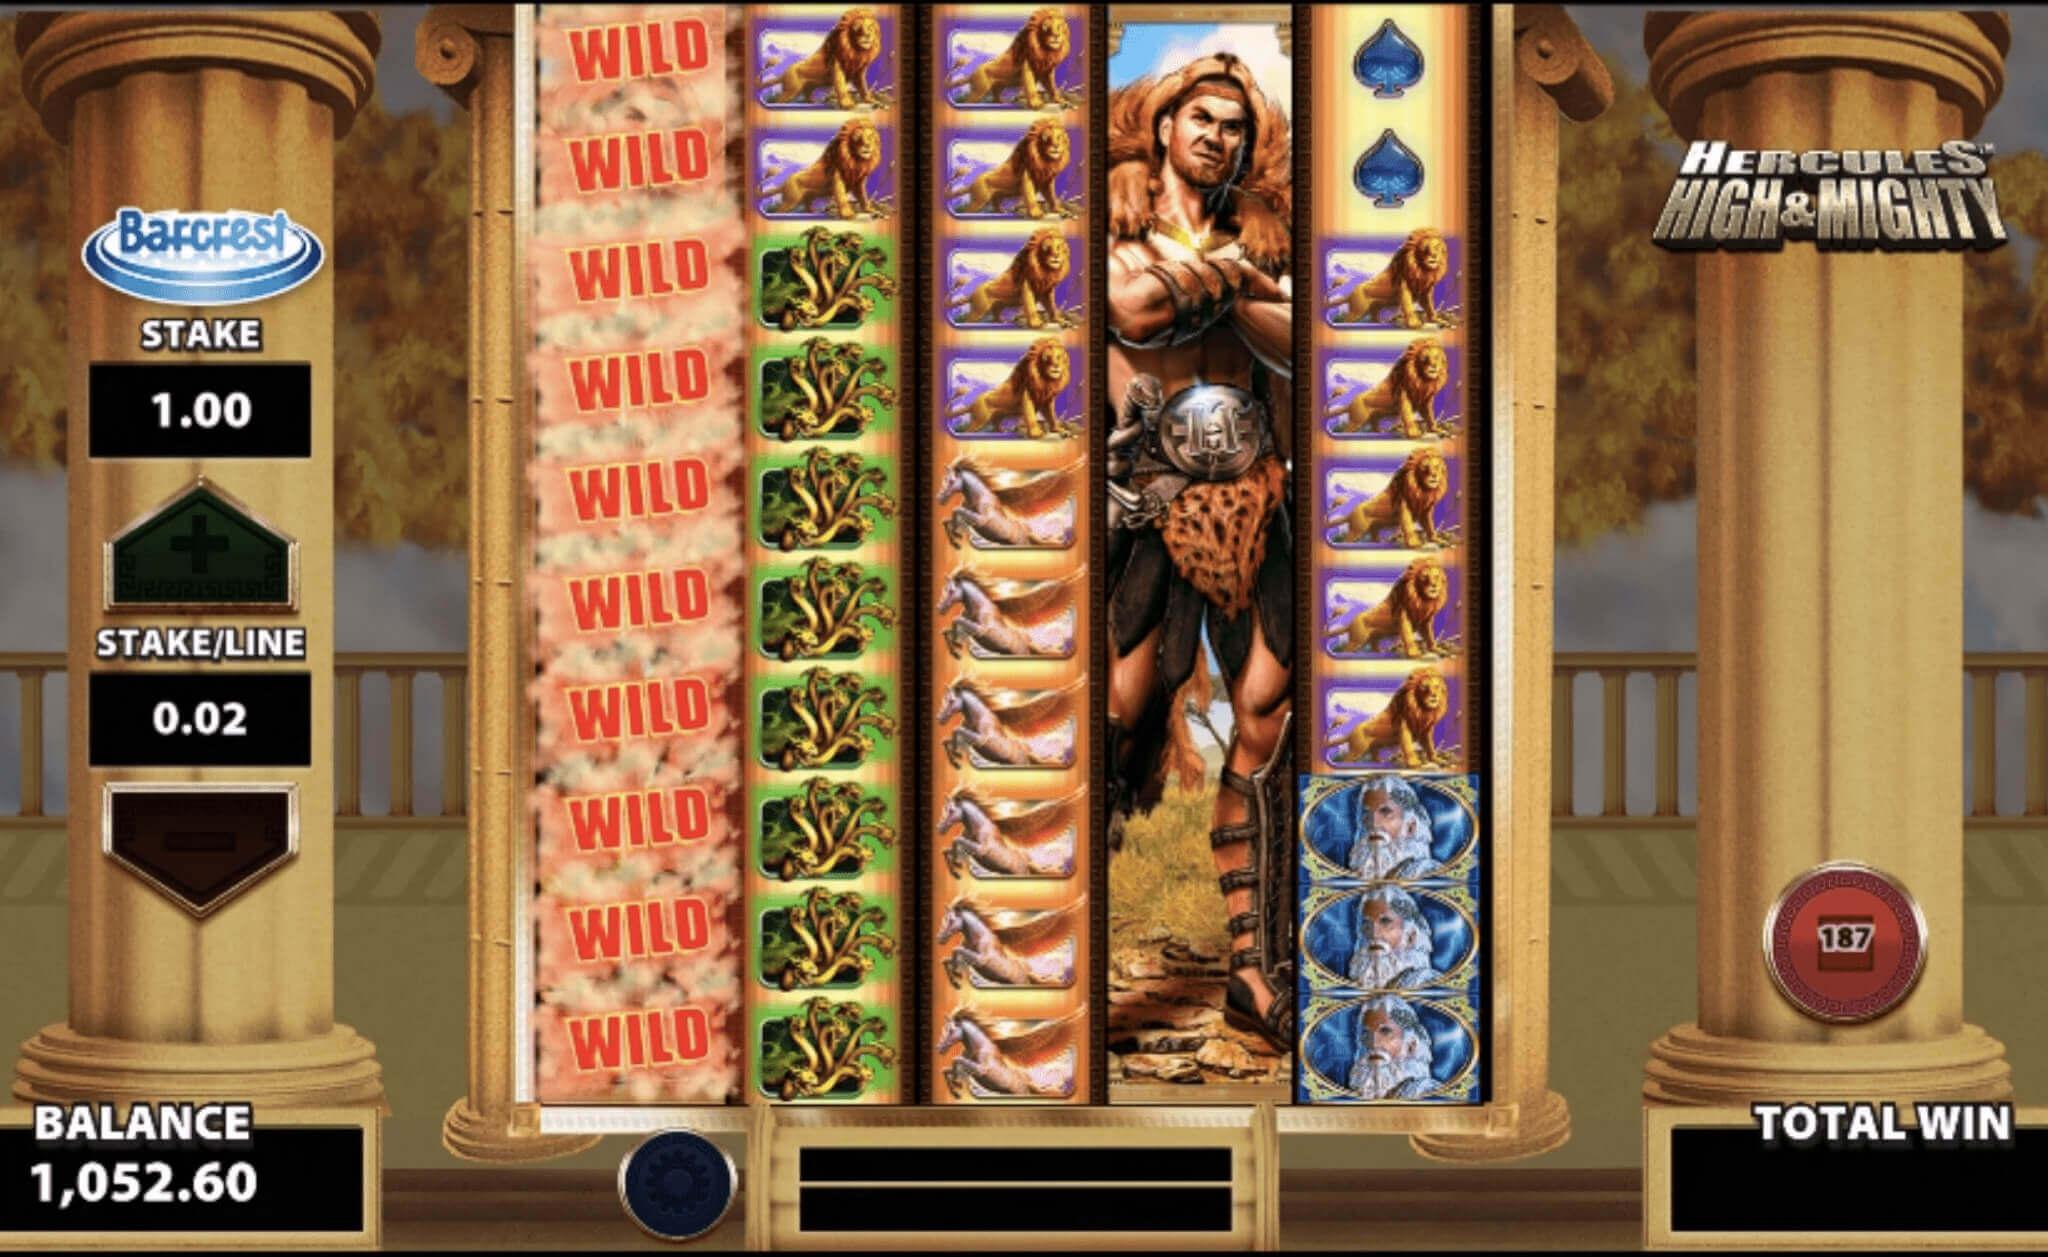 Hercules High and Mighty Slot Bonus